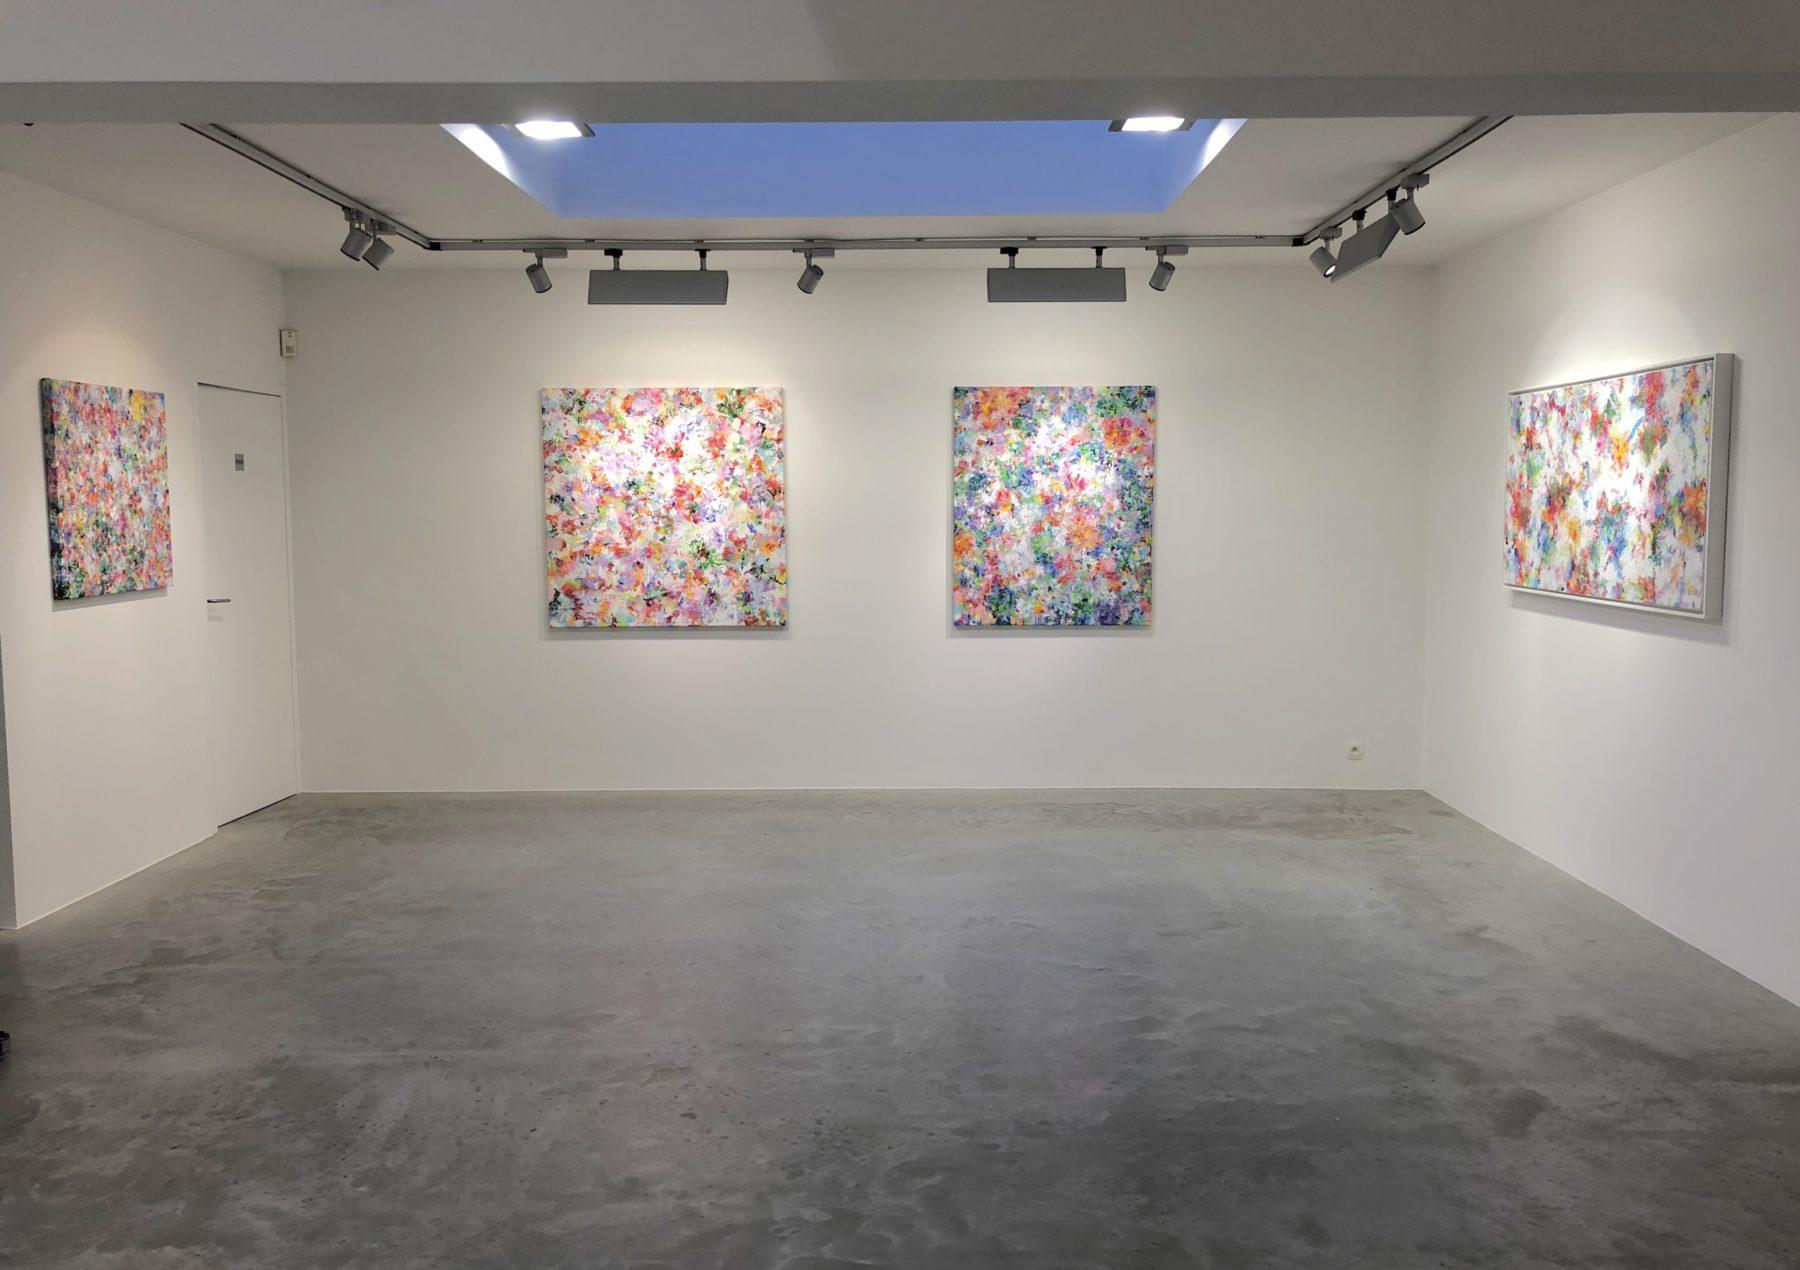 Alexandra De Grave exposition galerie florence rasson